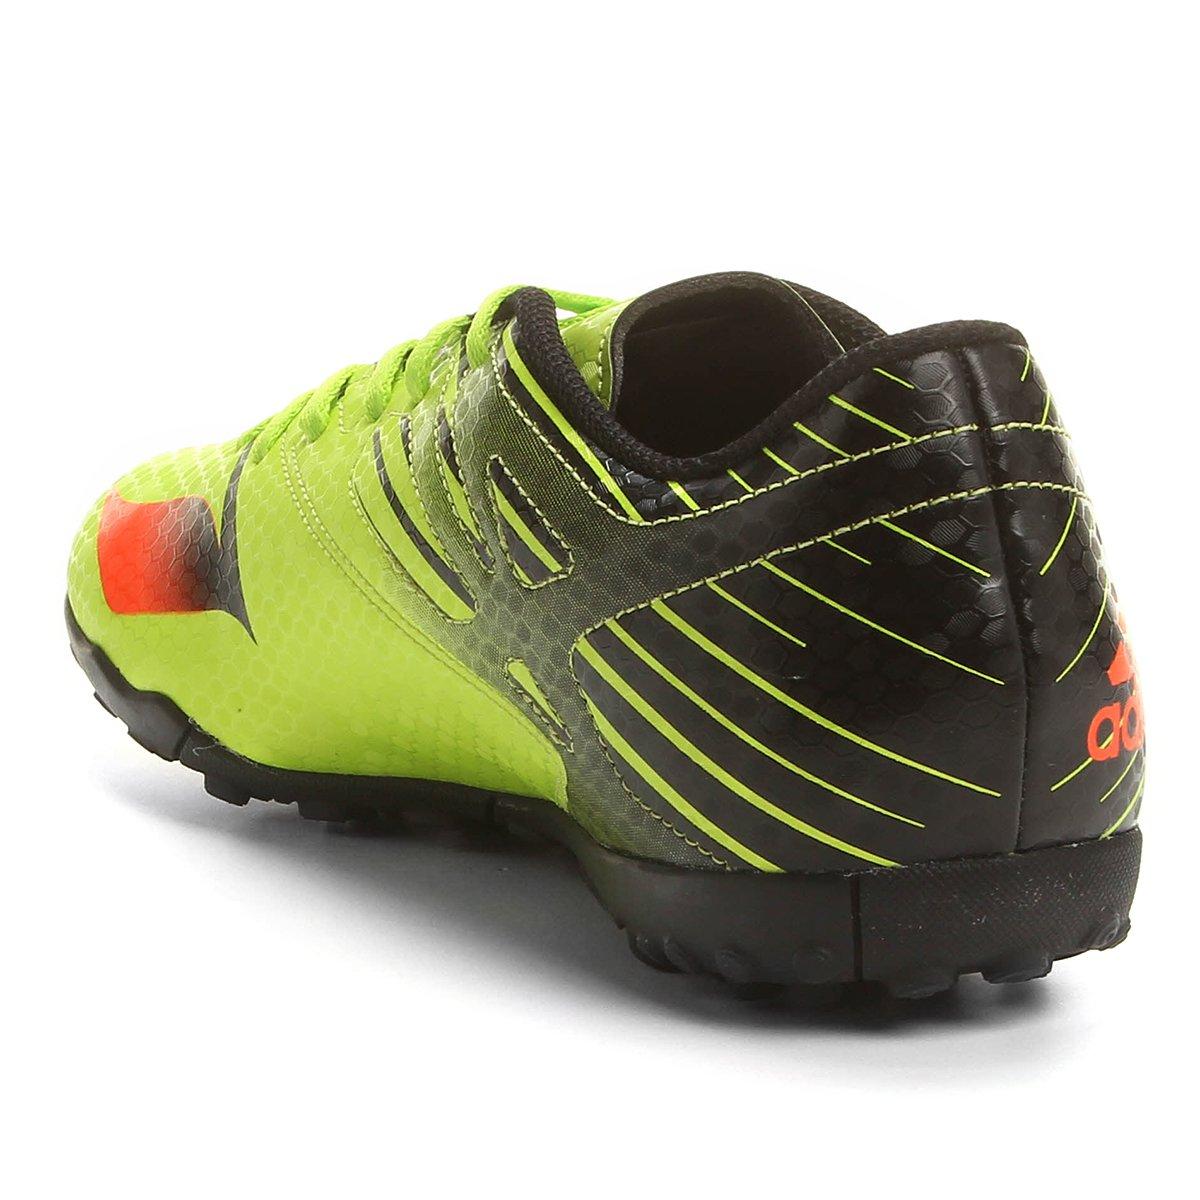 6b06779d27 Chuteira Society Adidas Messi 15.4 TF Masculina - Compre Agora ...